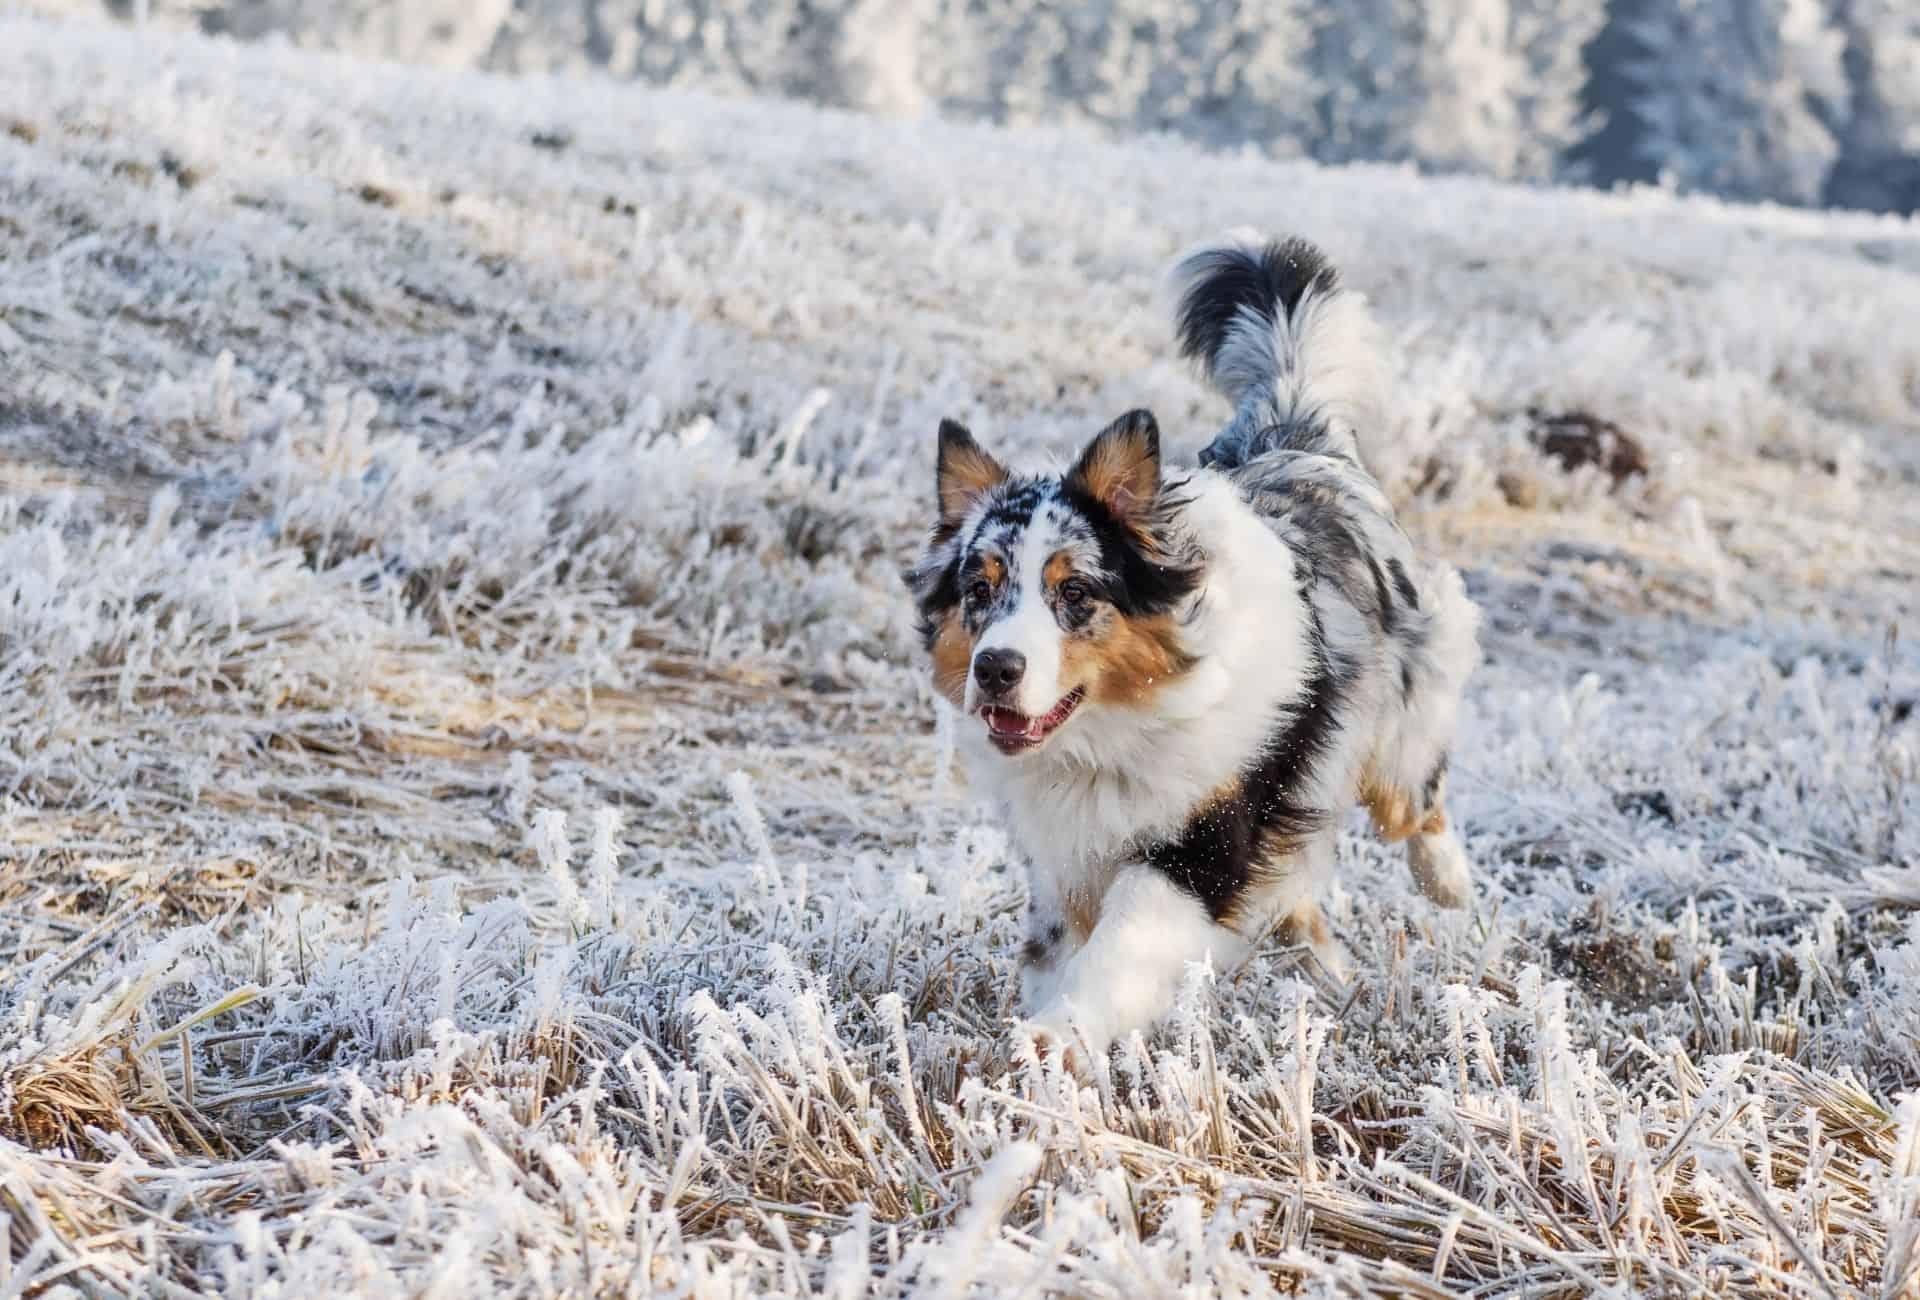 Merle Australian Shepherd running on snowy ground.